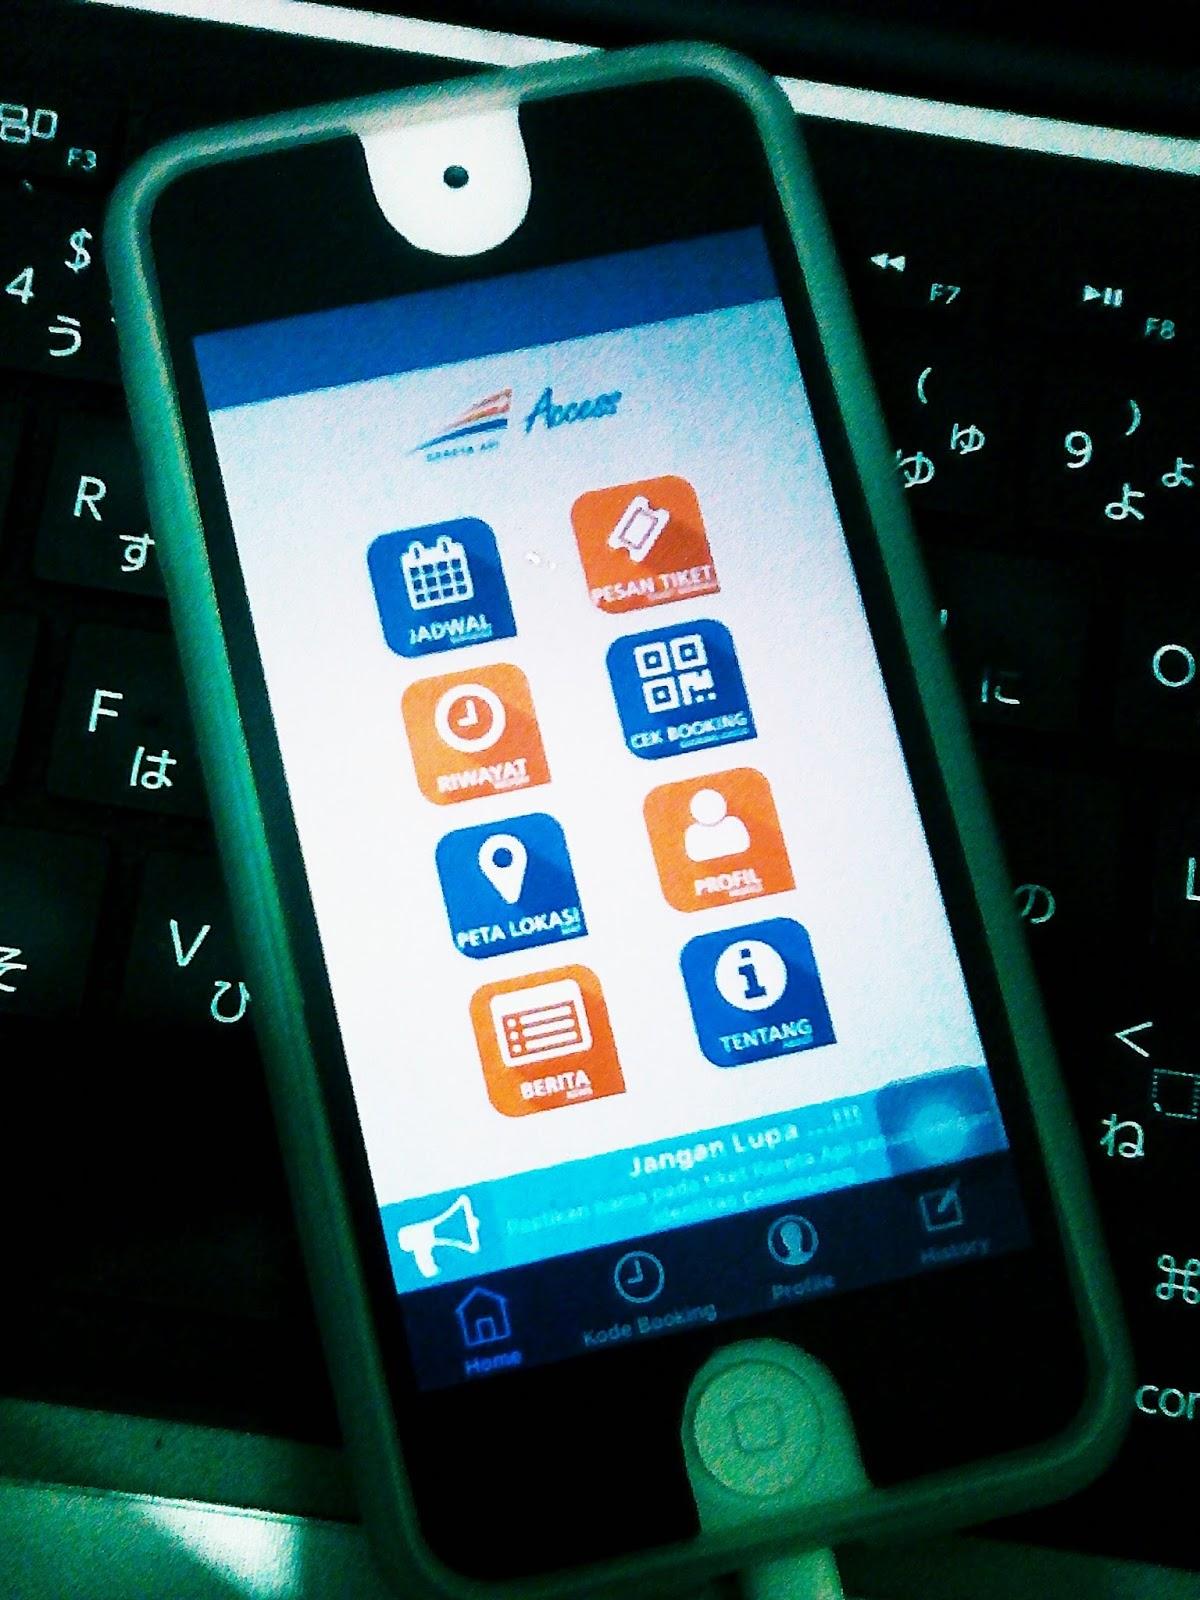 Cara Bayar Kode Booking Atau Kode Pembayaran Tiket Kereta Api Di Atm Link Share Panduan